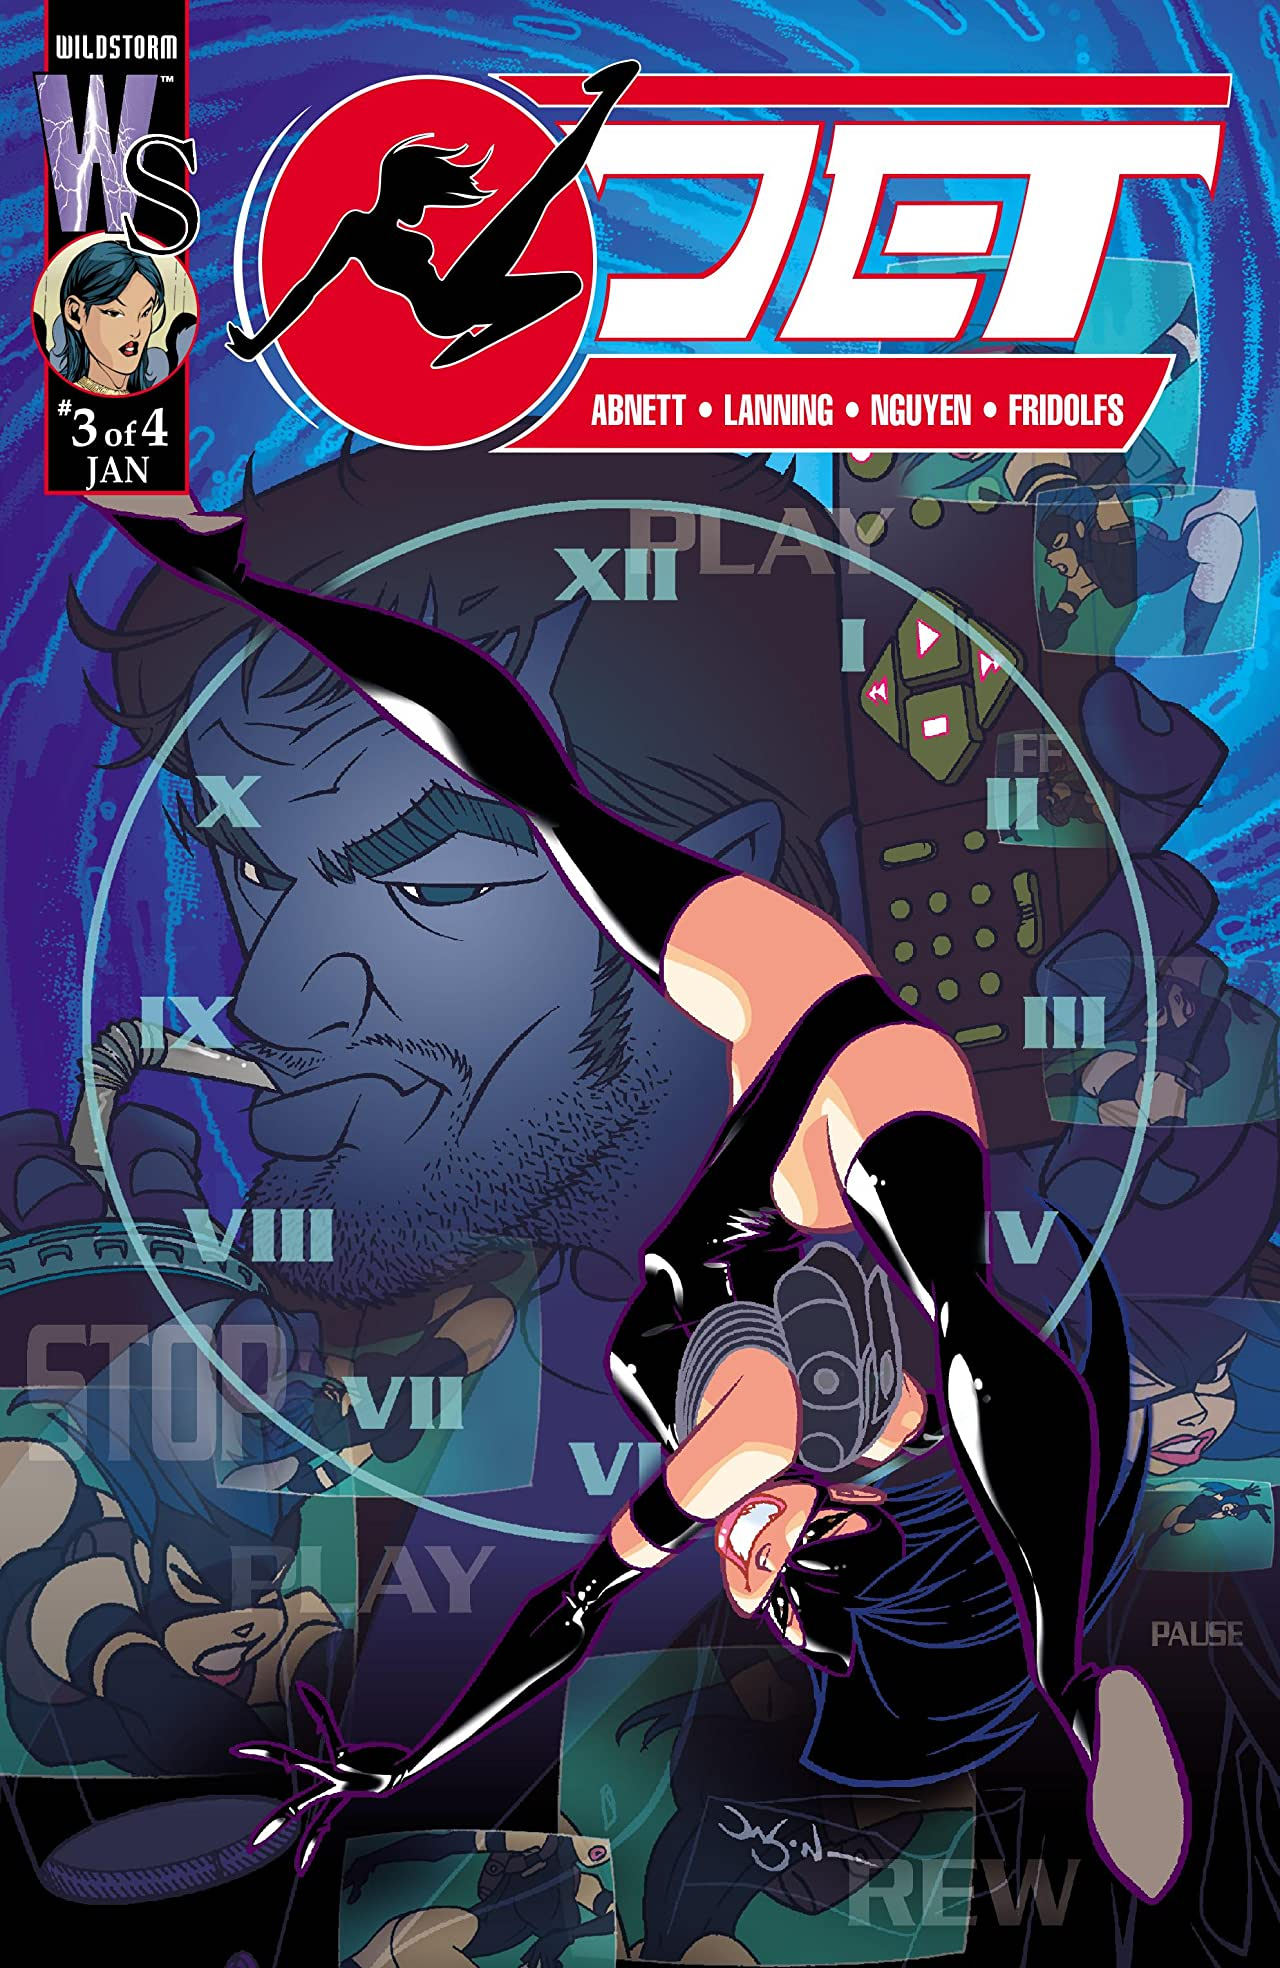 Jet (2000-2001) #3